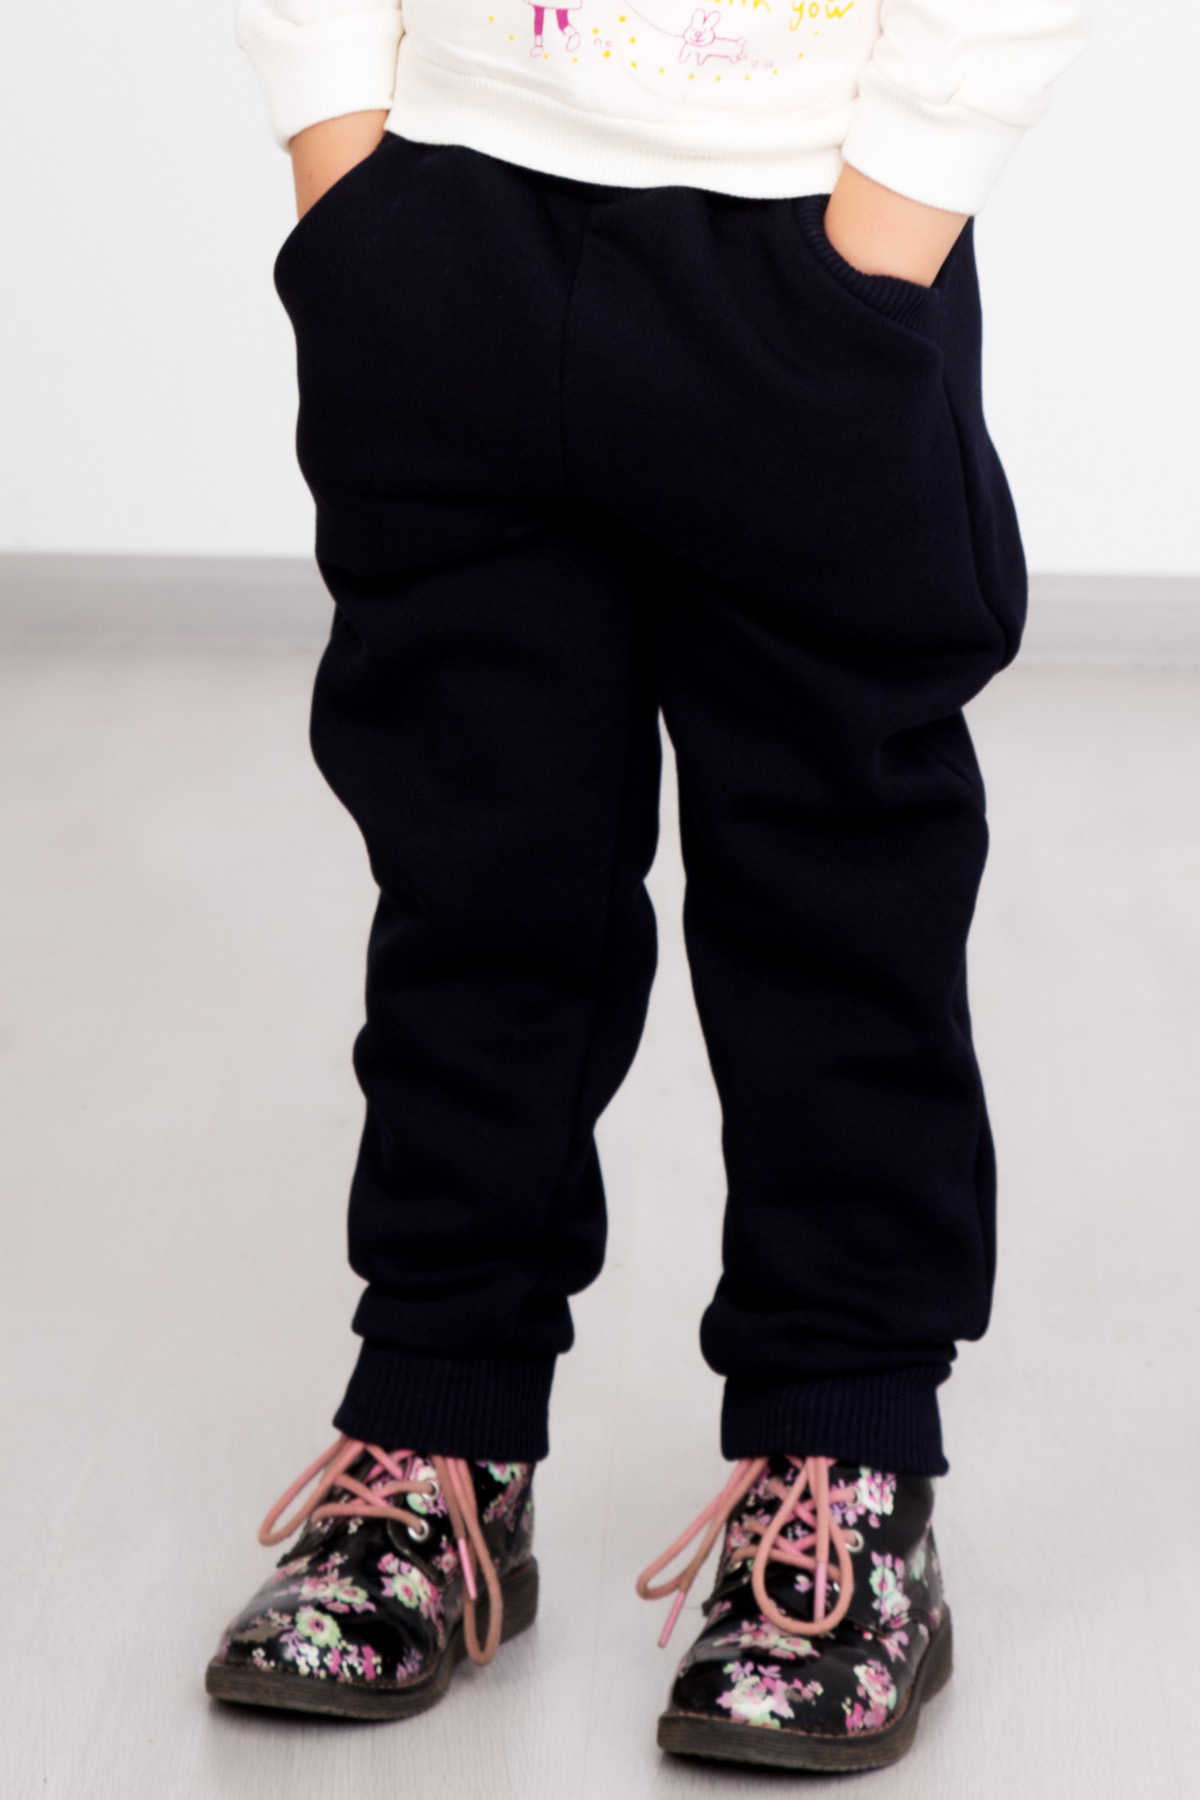 Дет. брюки Снег р. 30Шорты, бриджи, брюки<br><br><br>Тип: Дет. брюки<br>Размер: 30<br>Материал: Футер